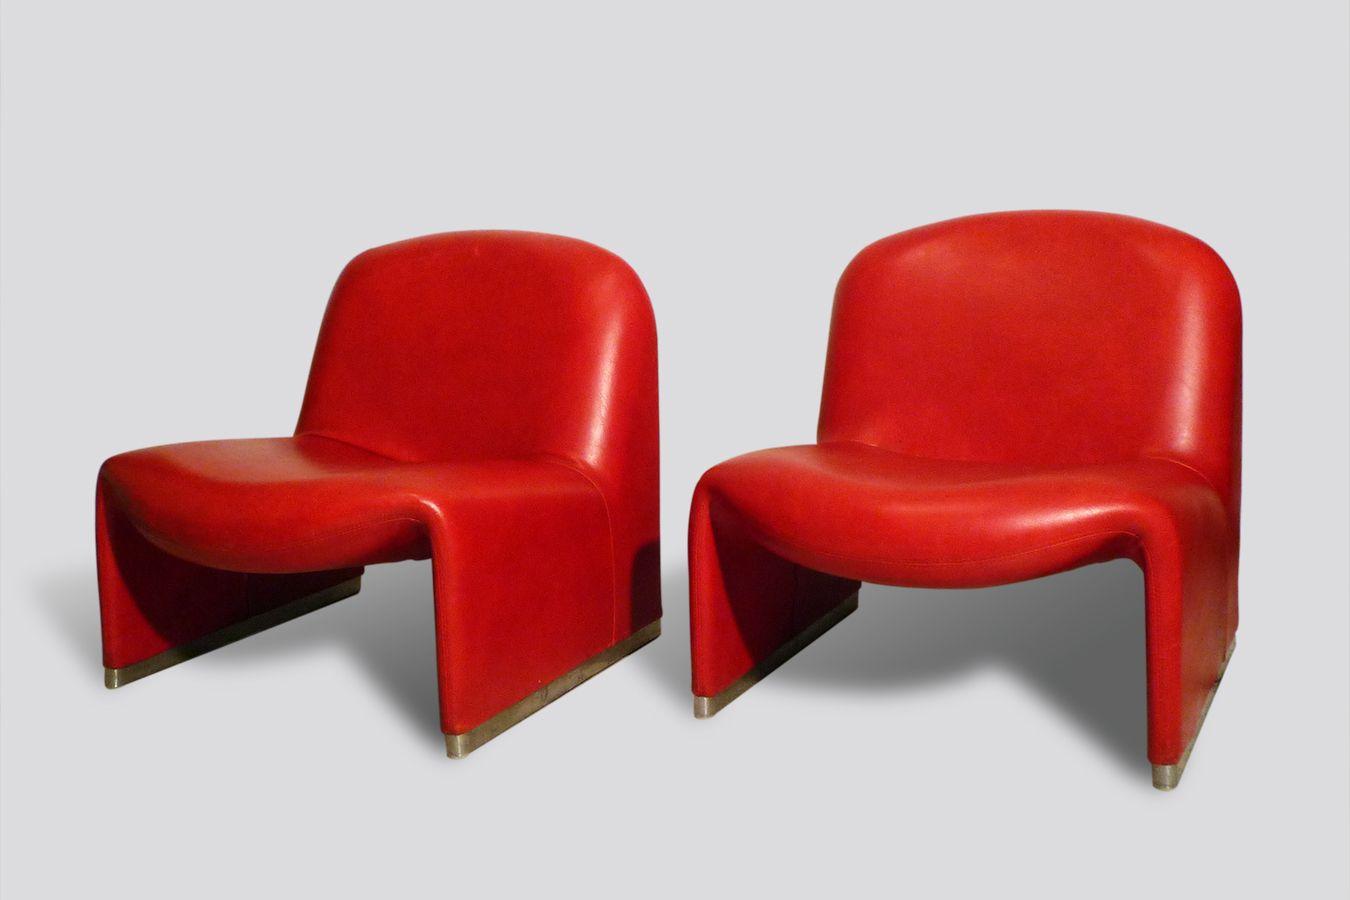 italienische mid century alki sessel von giancarlo piretti. Black Bedroom Furniture Sets. Home Design Ideas